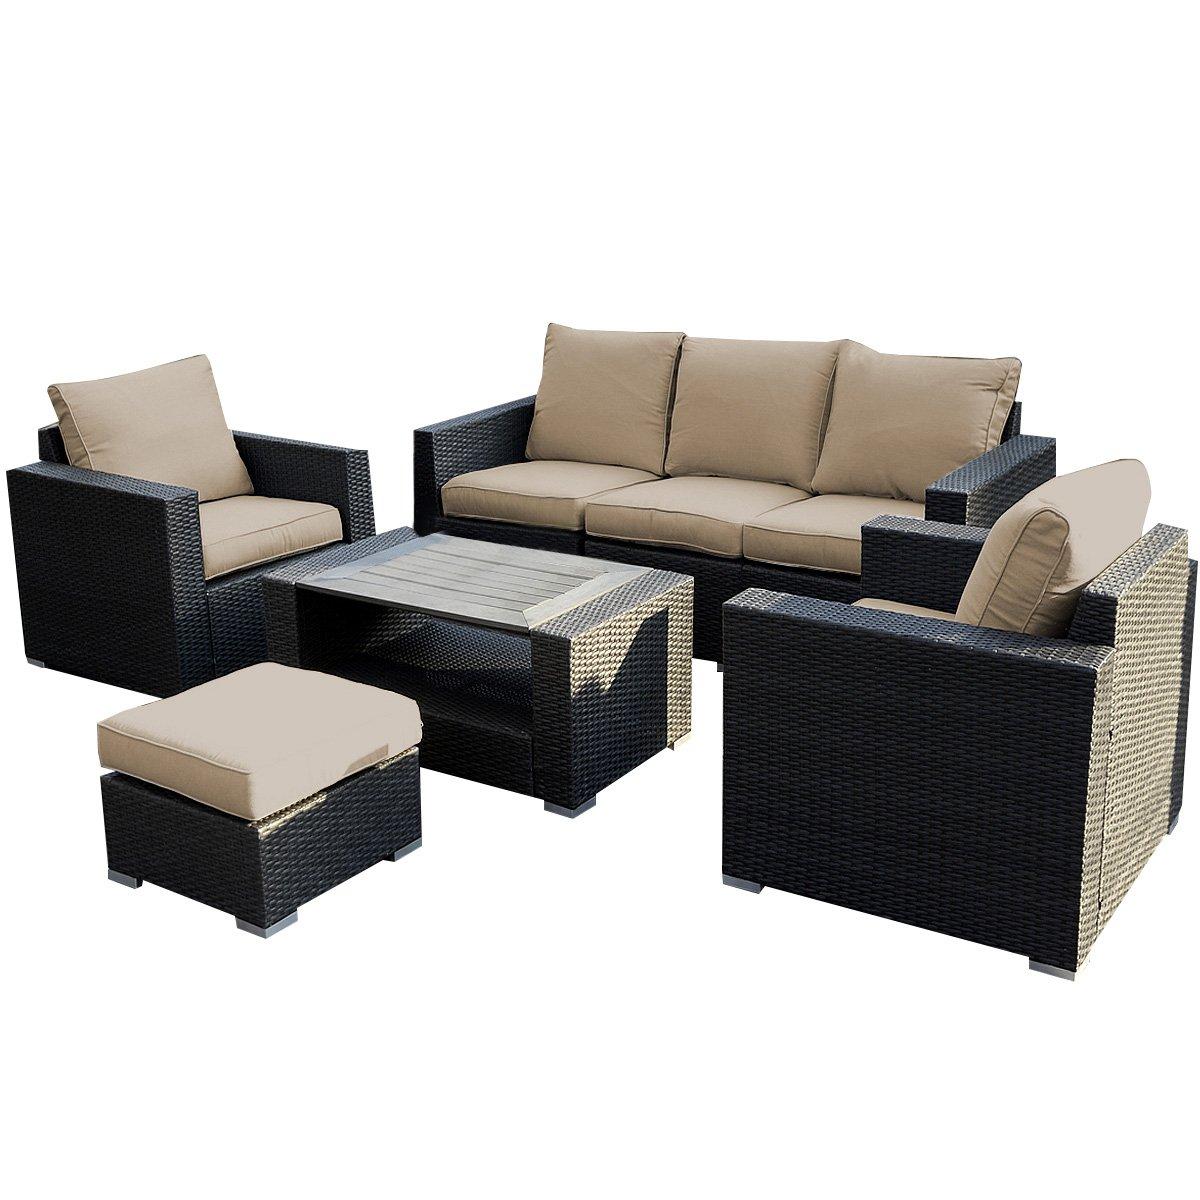 Amazon.com : Giantex 7pc Outdoor Patio Patio Sectional Furniture Pe Wicker  Rattan Sofa Set Deck Couch : Garden U0026 Outdoor